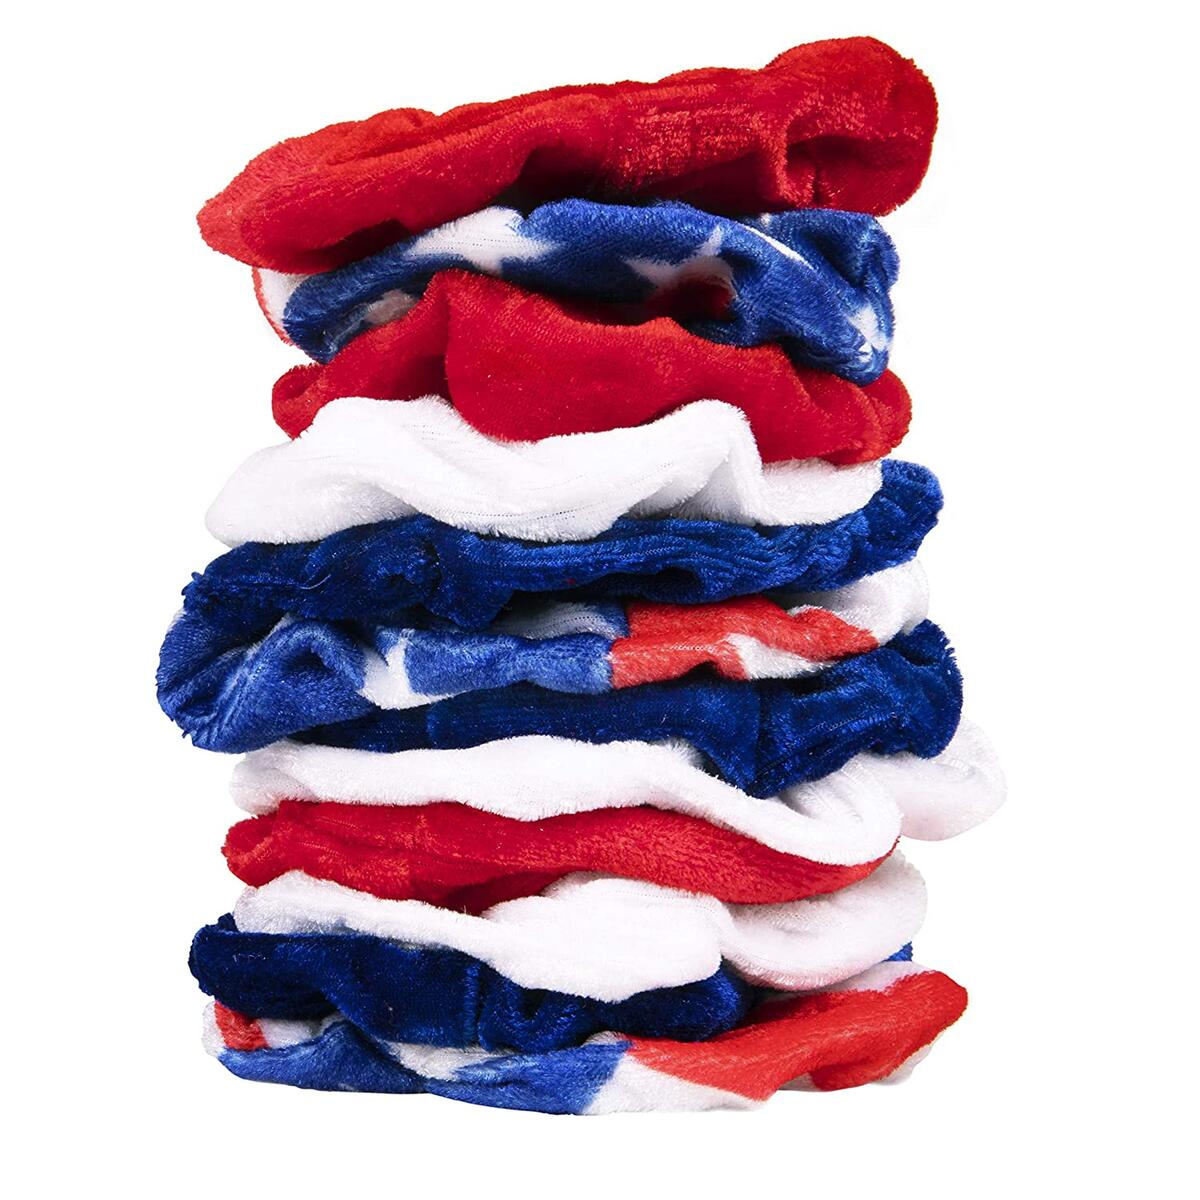 Patriotic Scrunchie Assortment (12-Pack), Hair Ties for Women